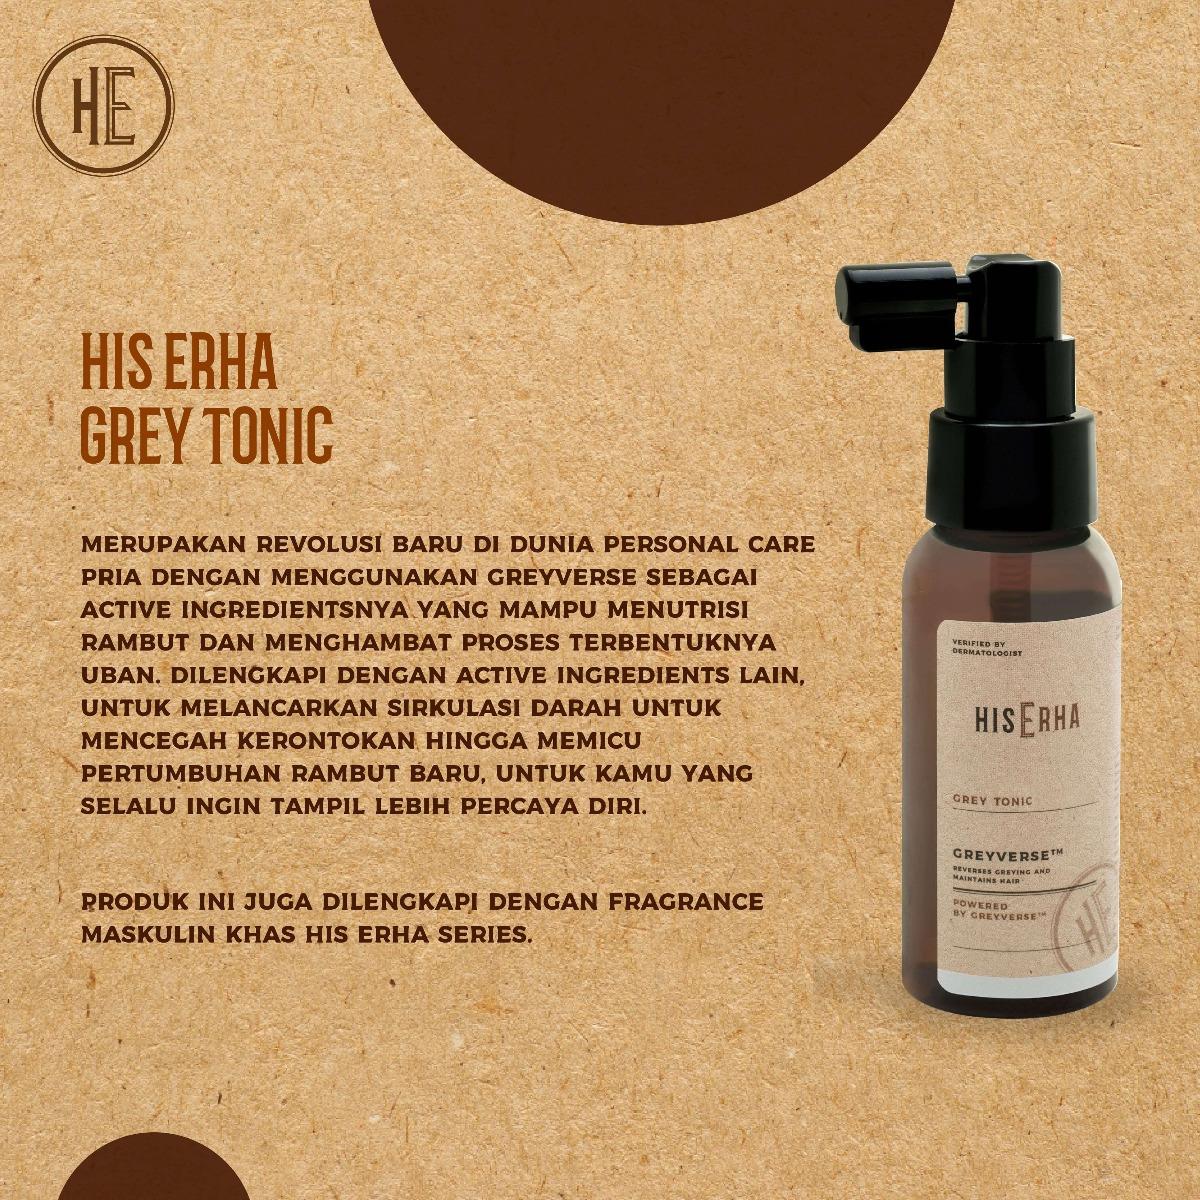 Grey Tonic